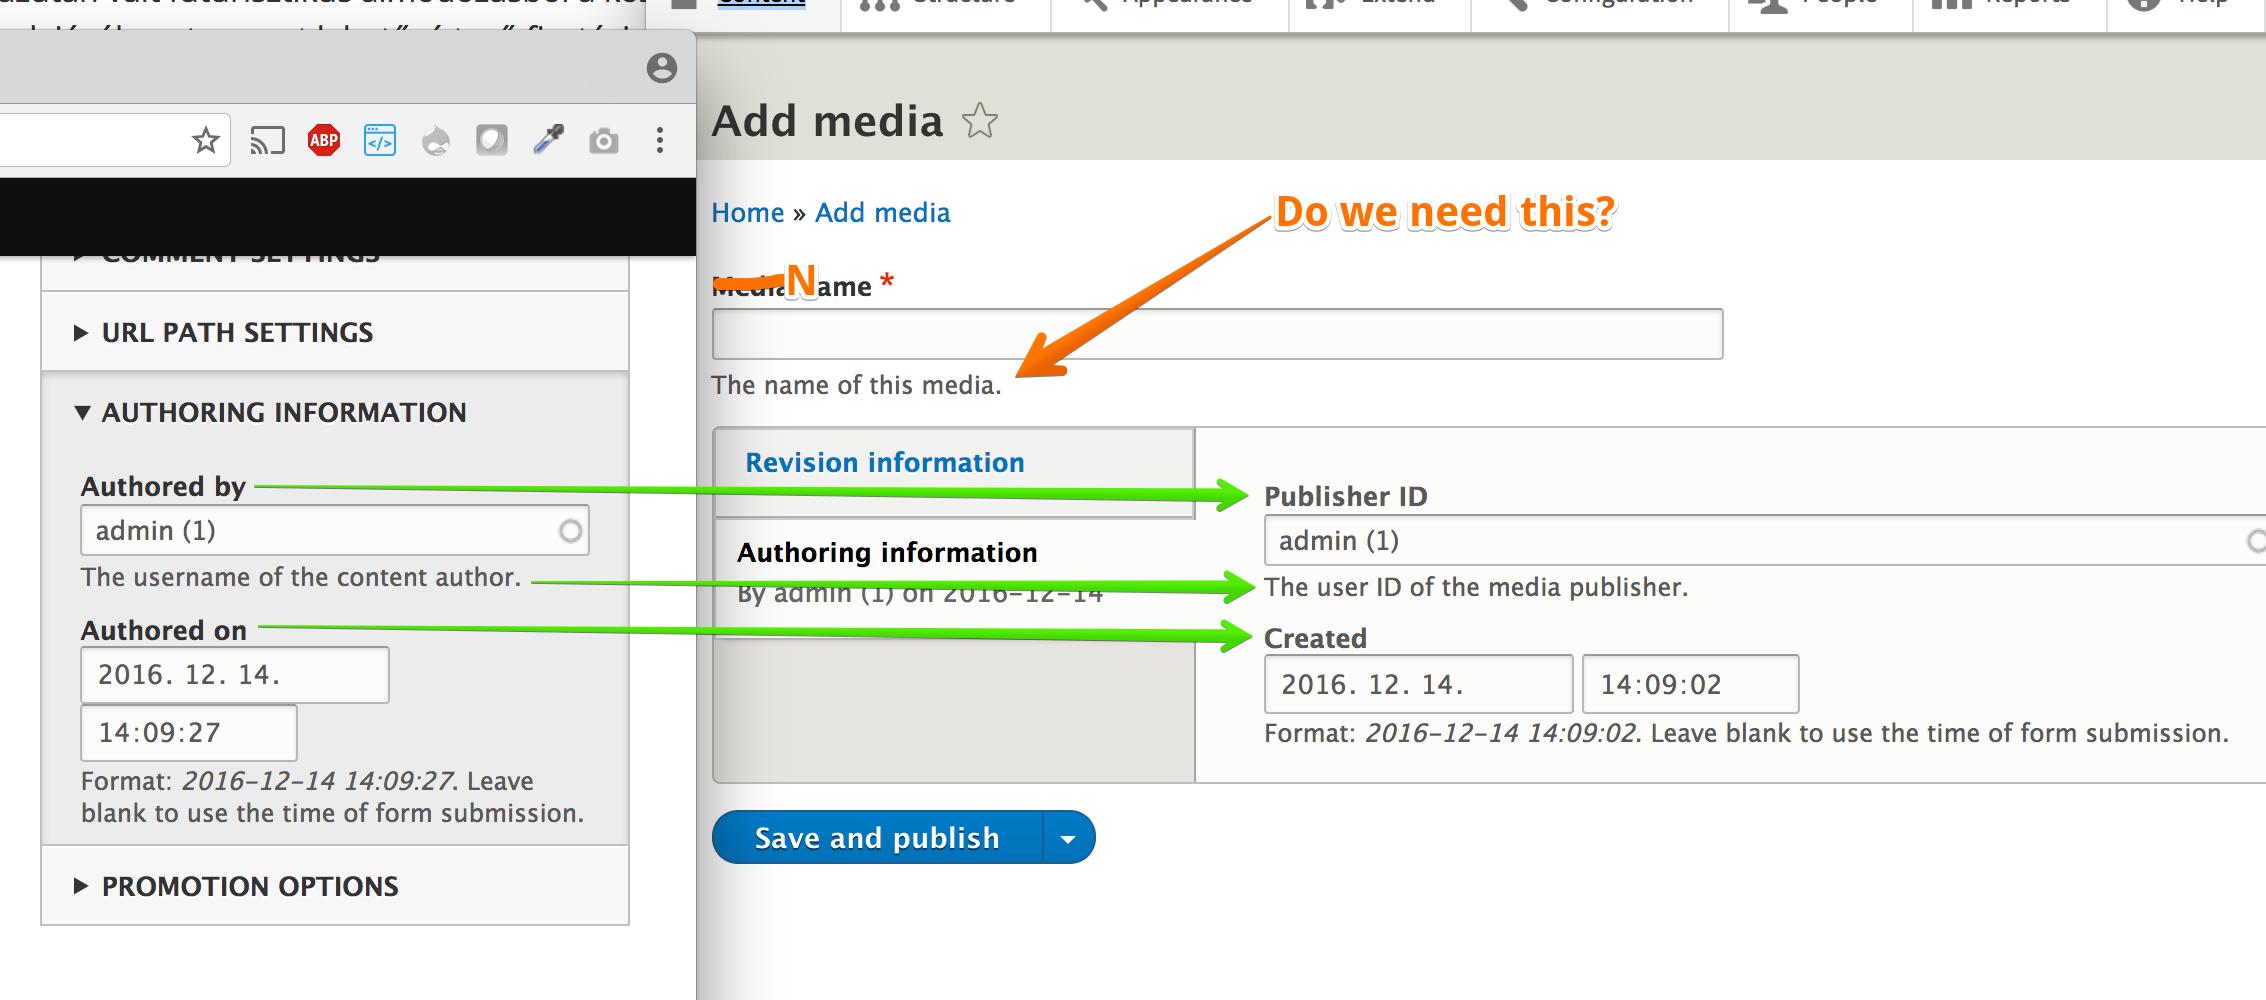 Bring Media entity module to core as Media module [#2831274